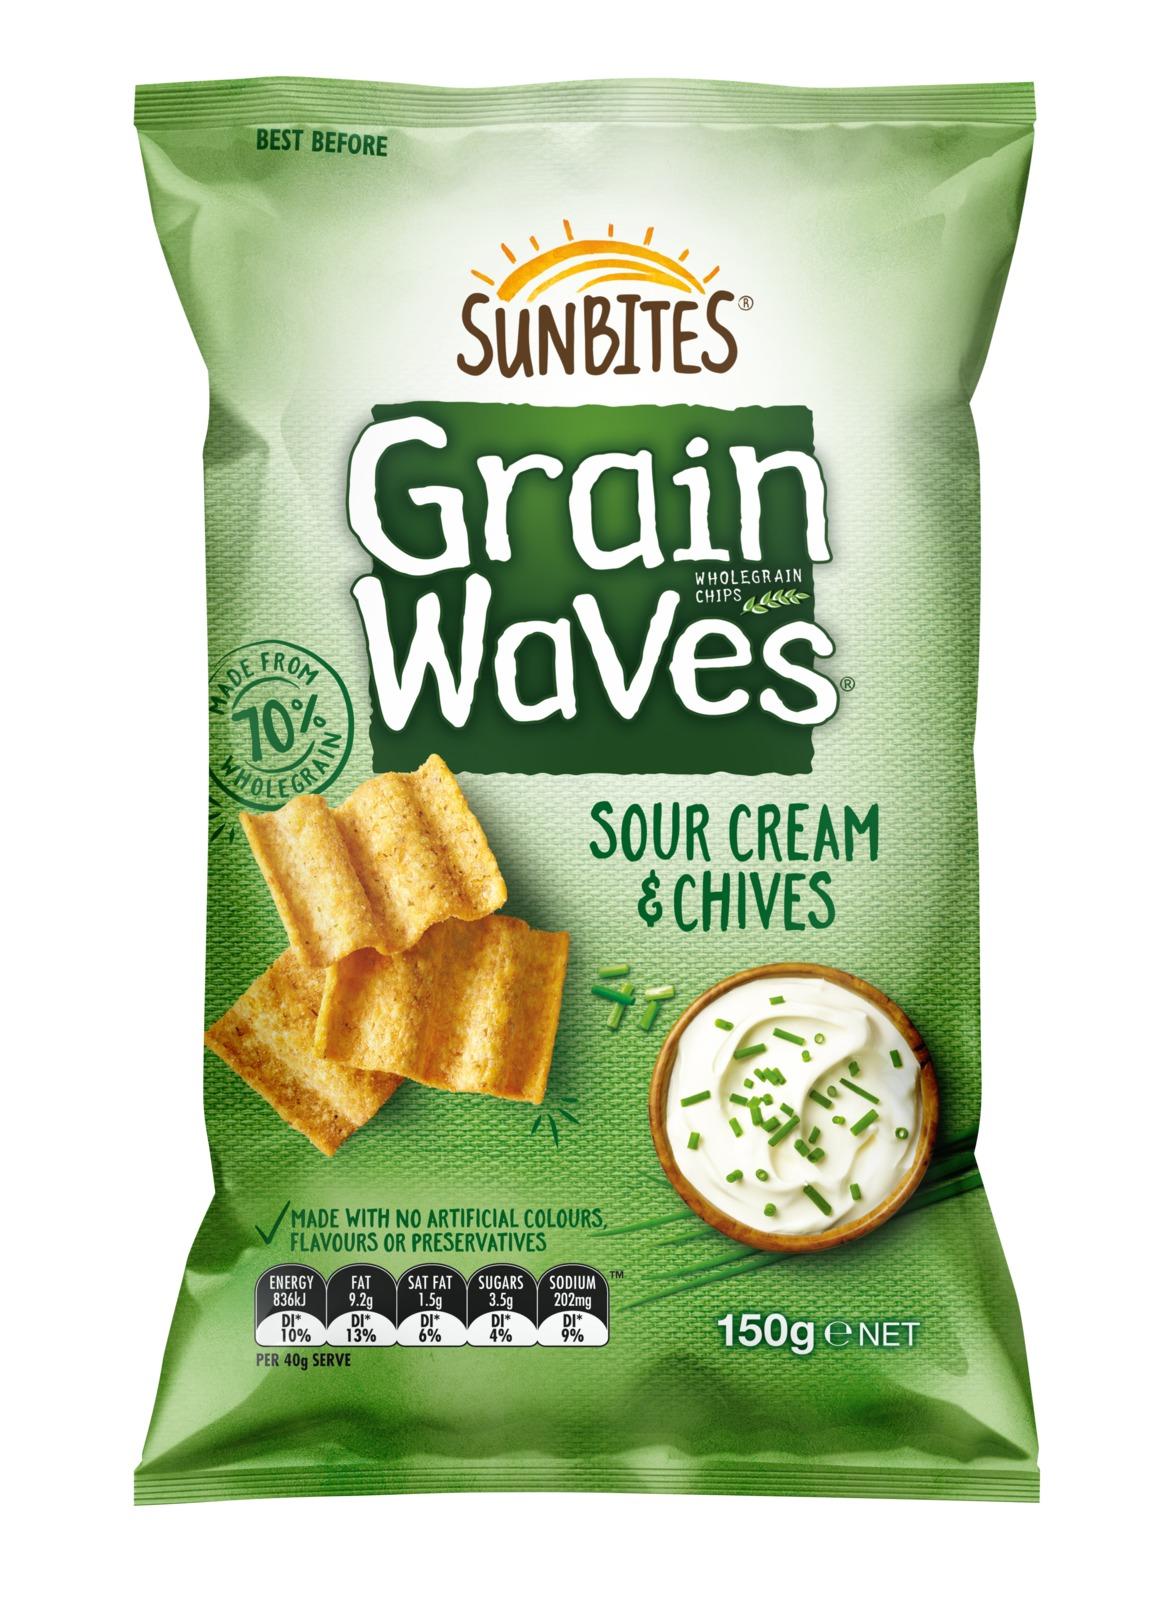 Sunbites Grain Waves - Sour Cream & Chives (150g) image